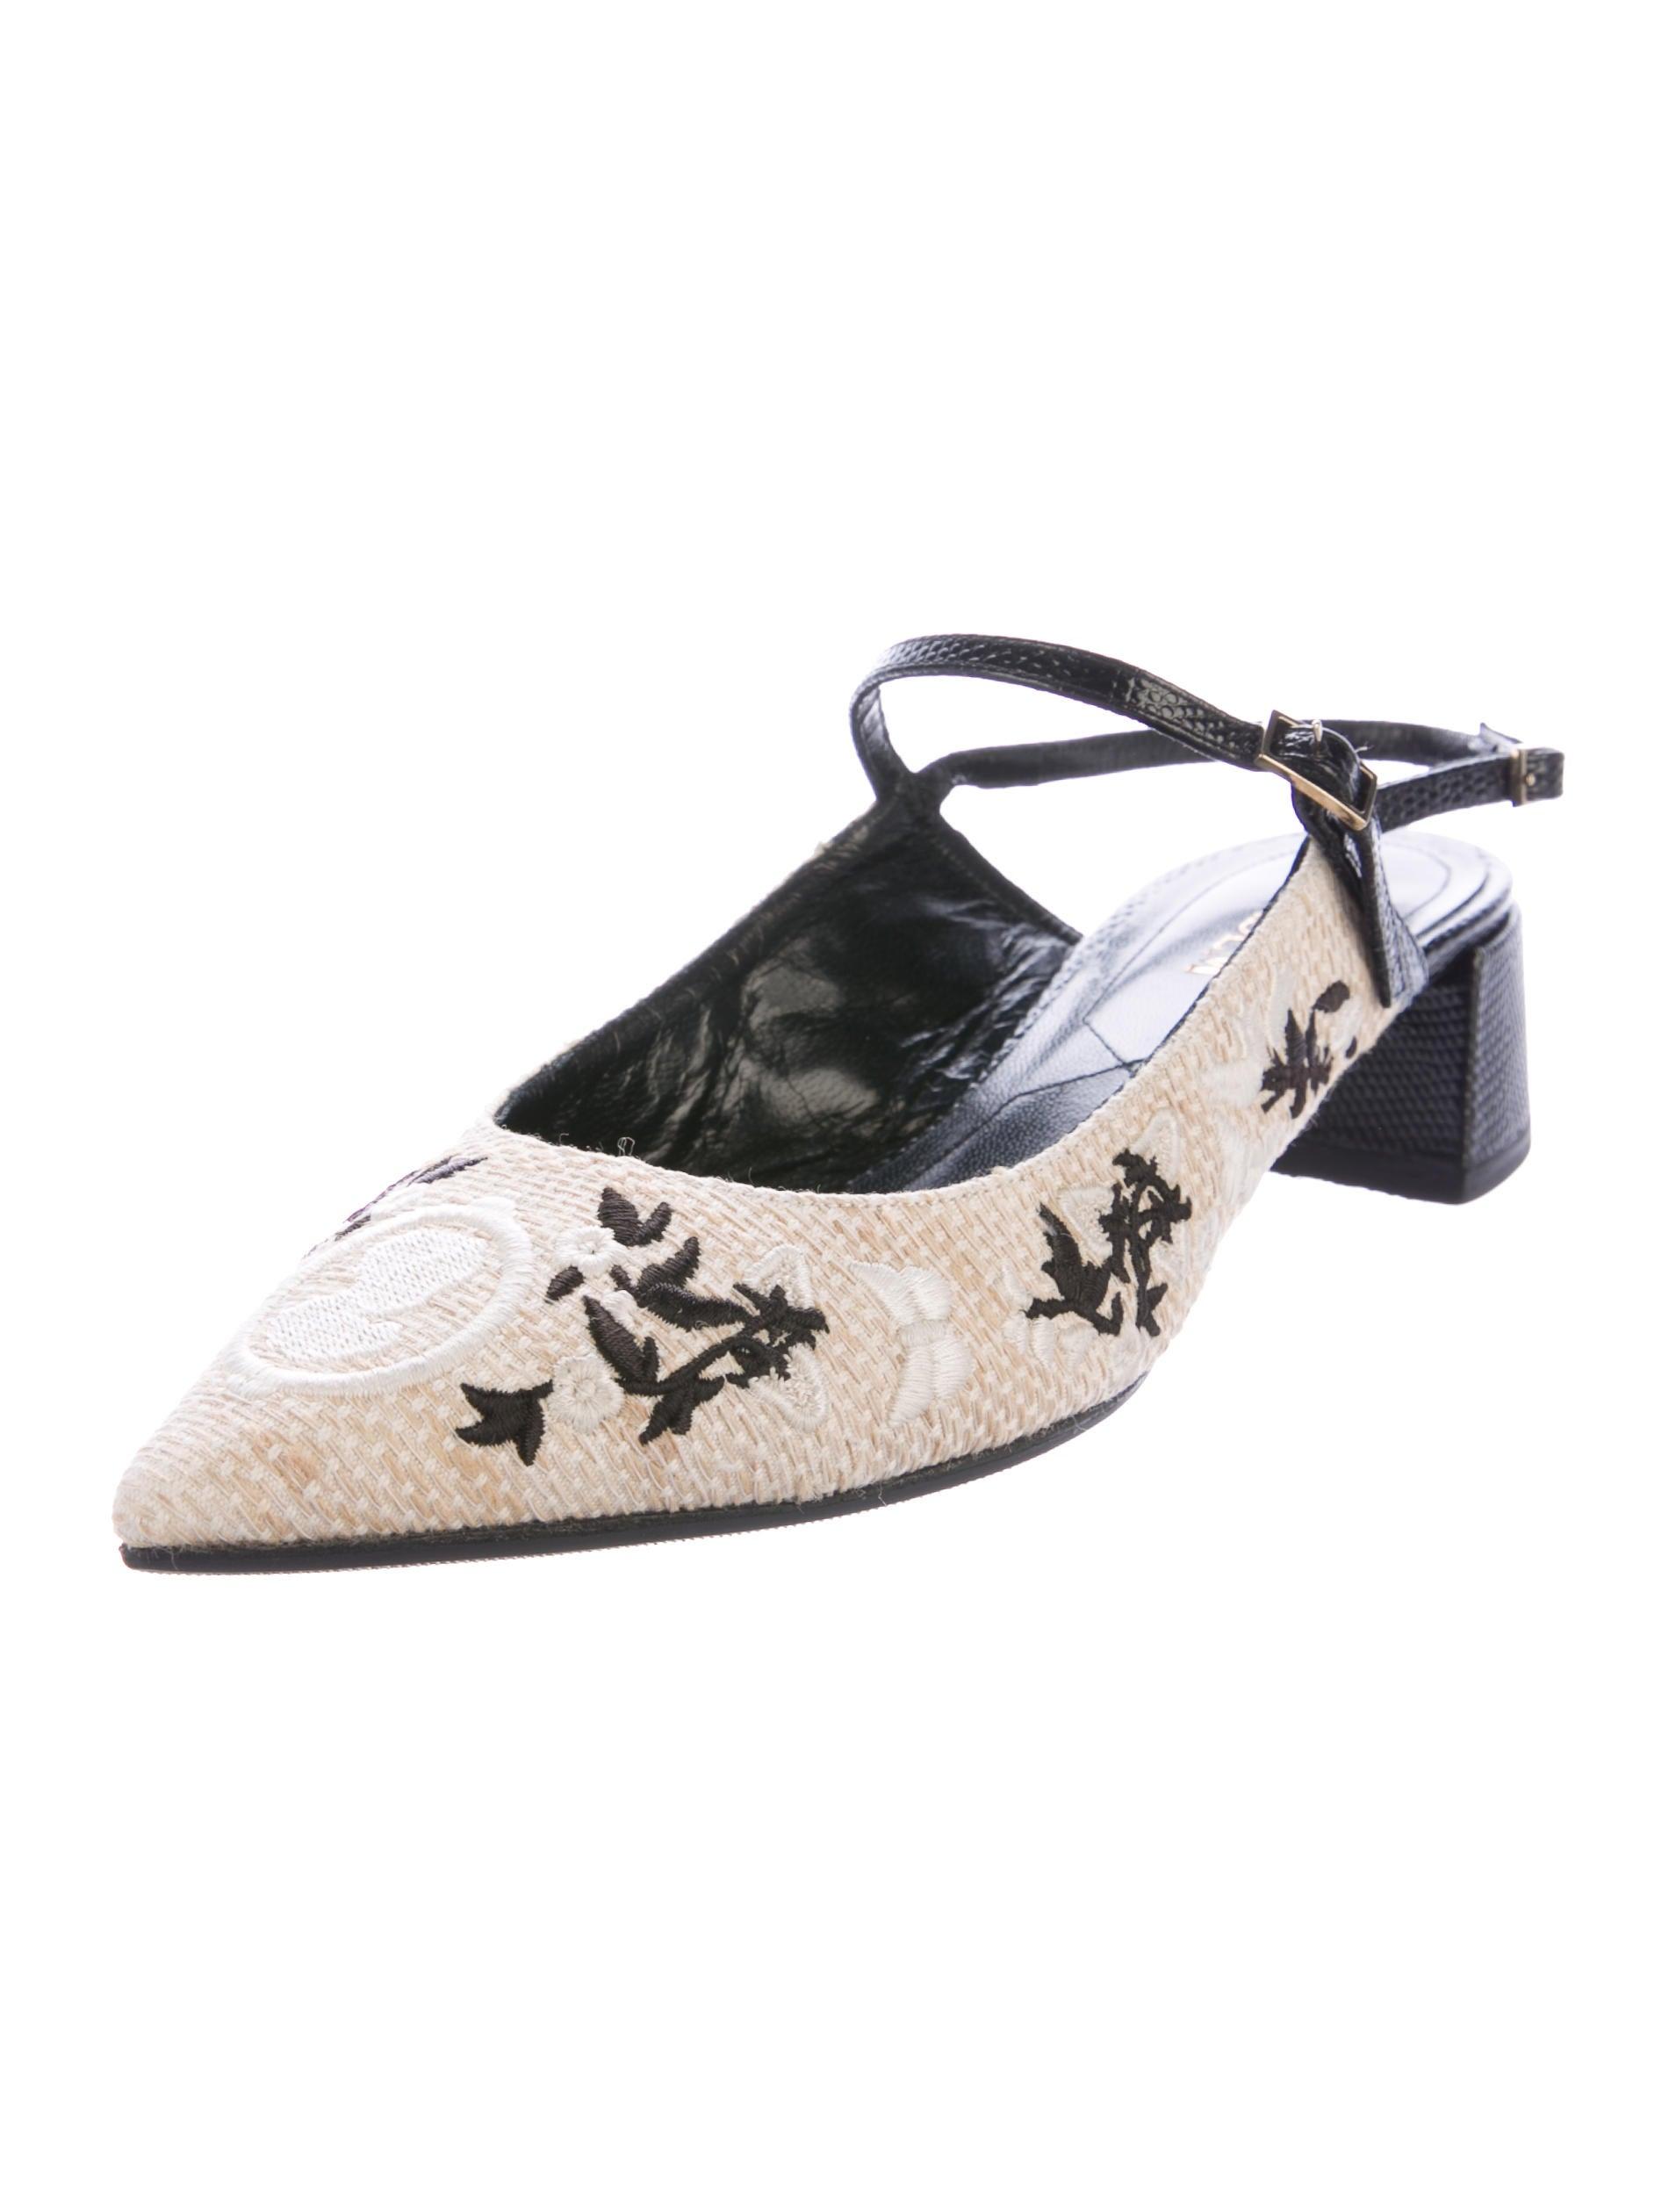 Erdem Embroidered Aerin Pumps - Shoes